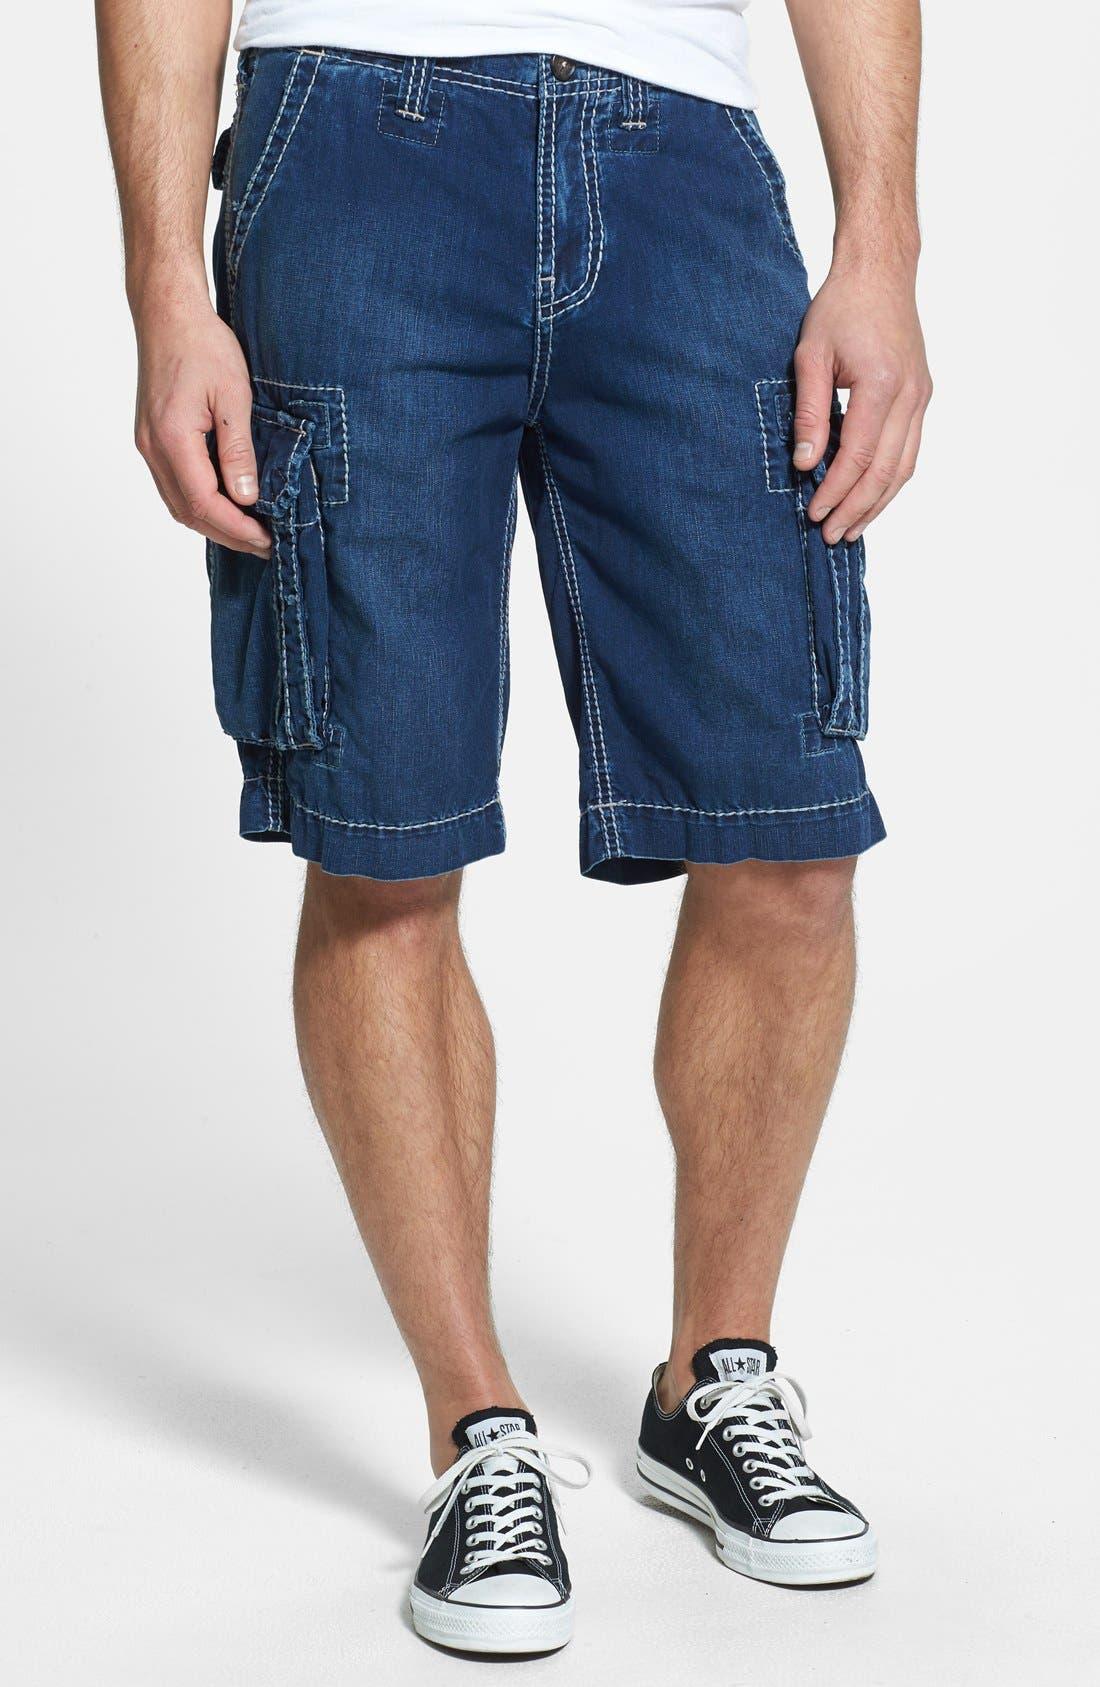 Alternate Image 1 Selected - True Religion Brand Jeans 'Commander - Big T' Denim Cargo Shorts